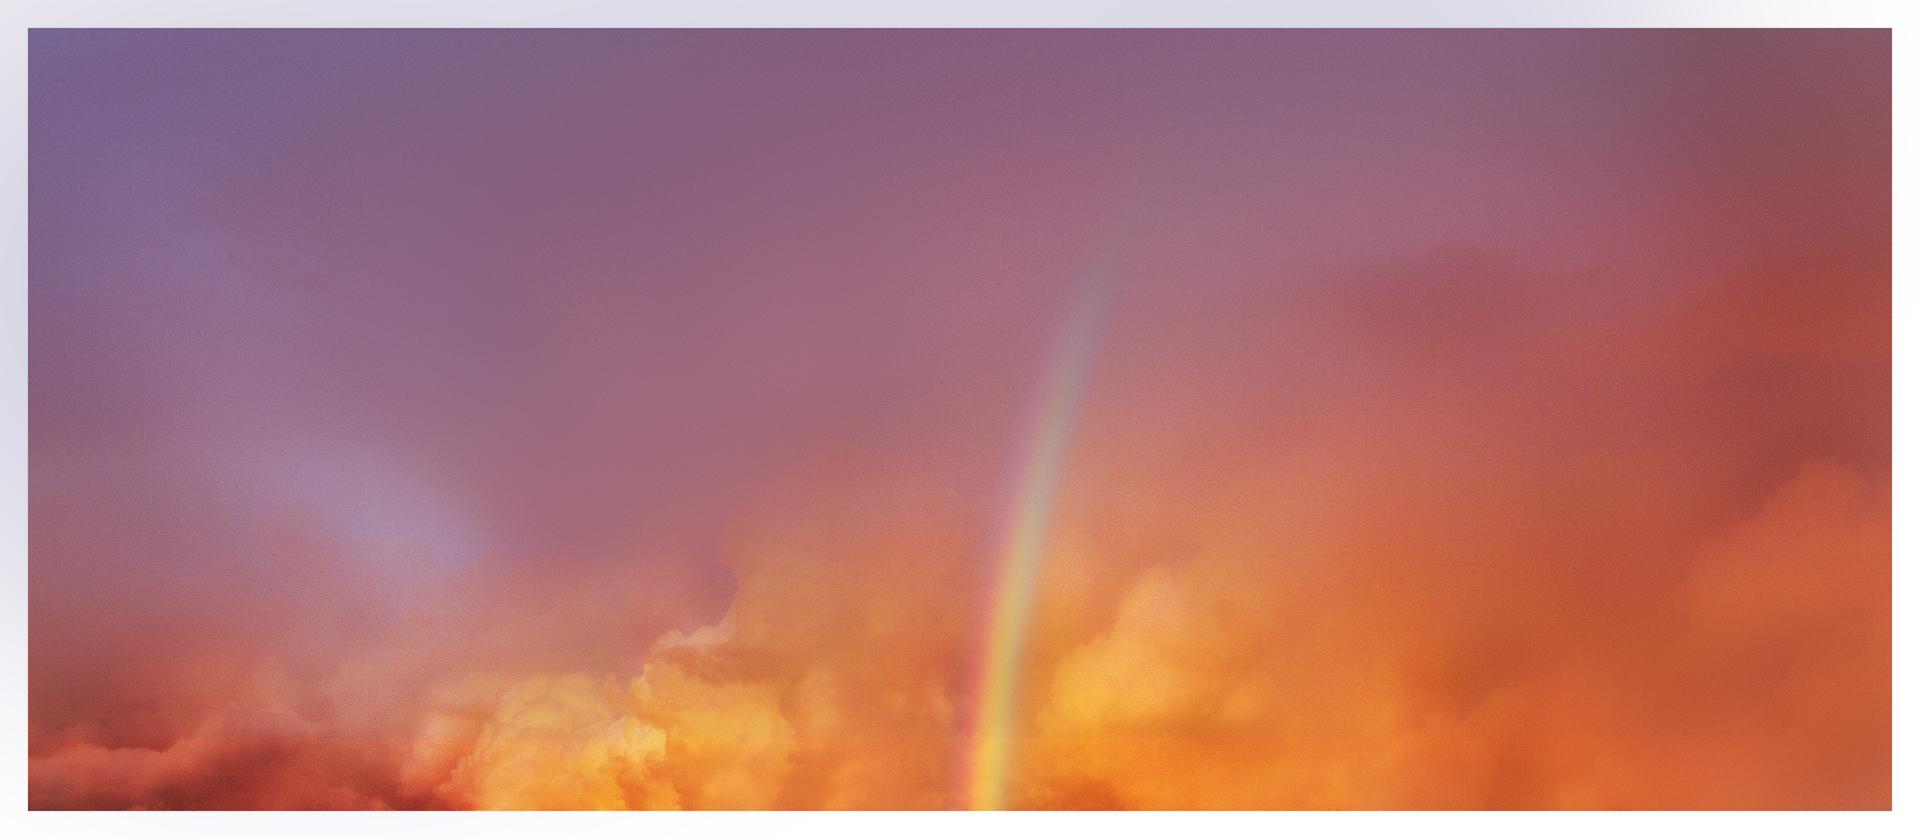 The elusive Rainbow Spout